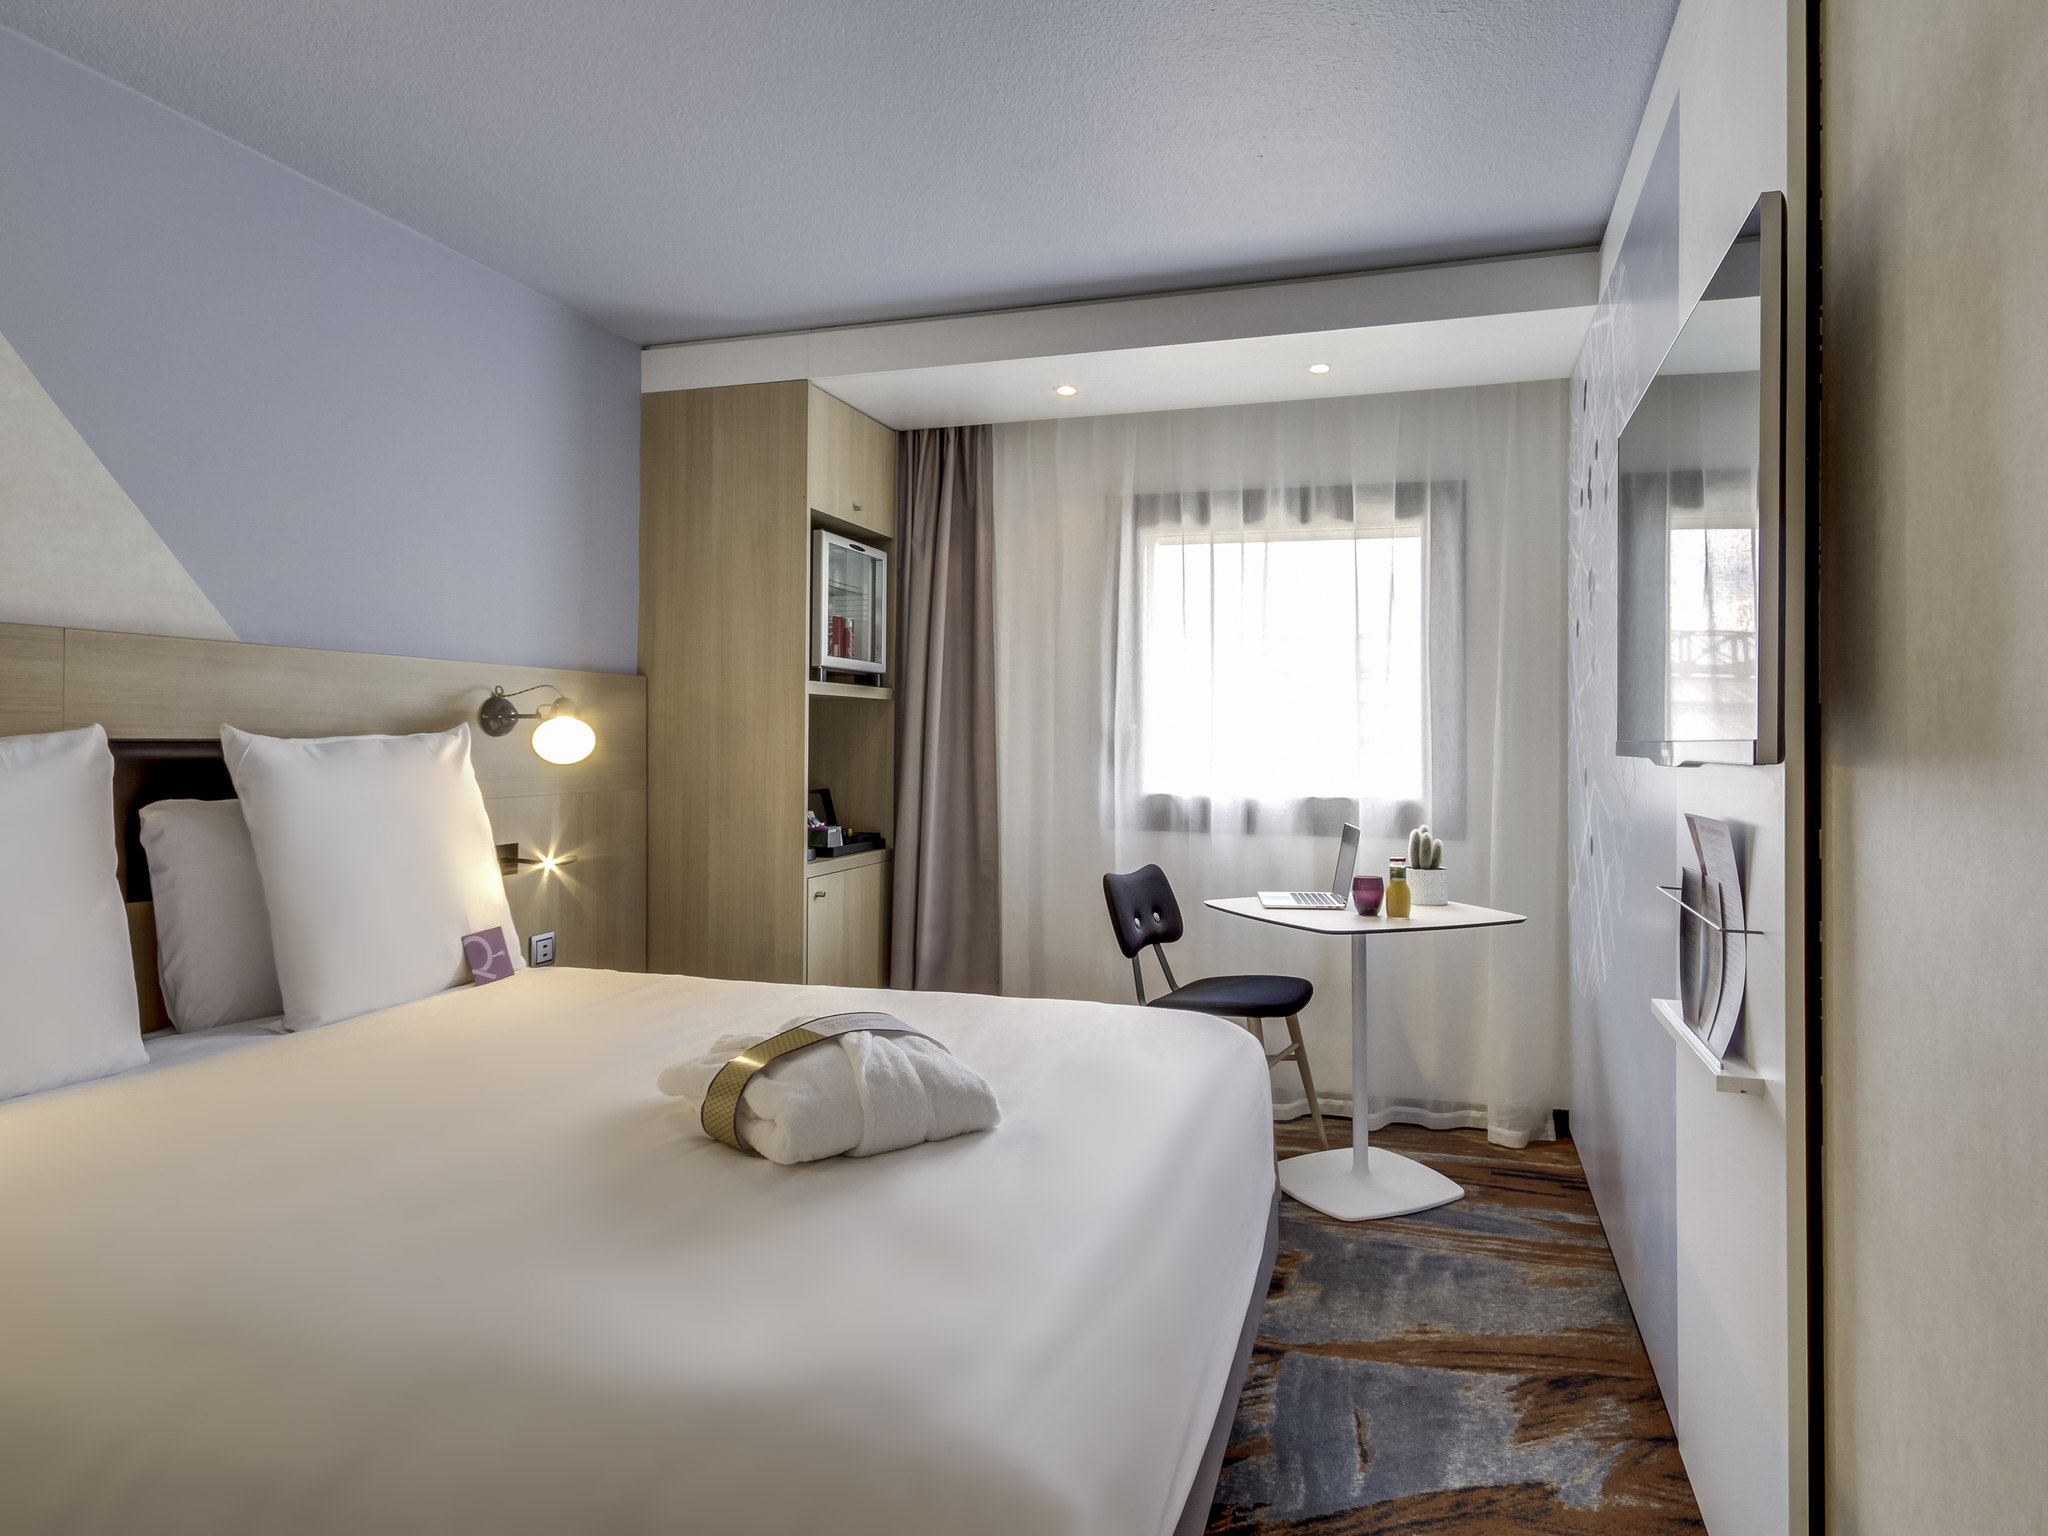 Hotel – Mercure Paris Gare de Lyon TGV hotel